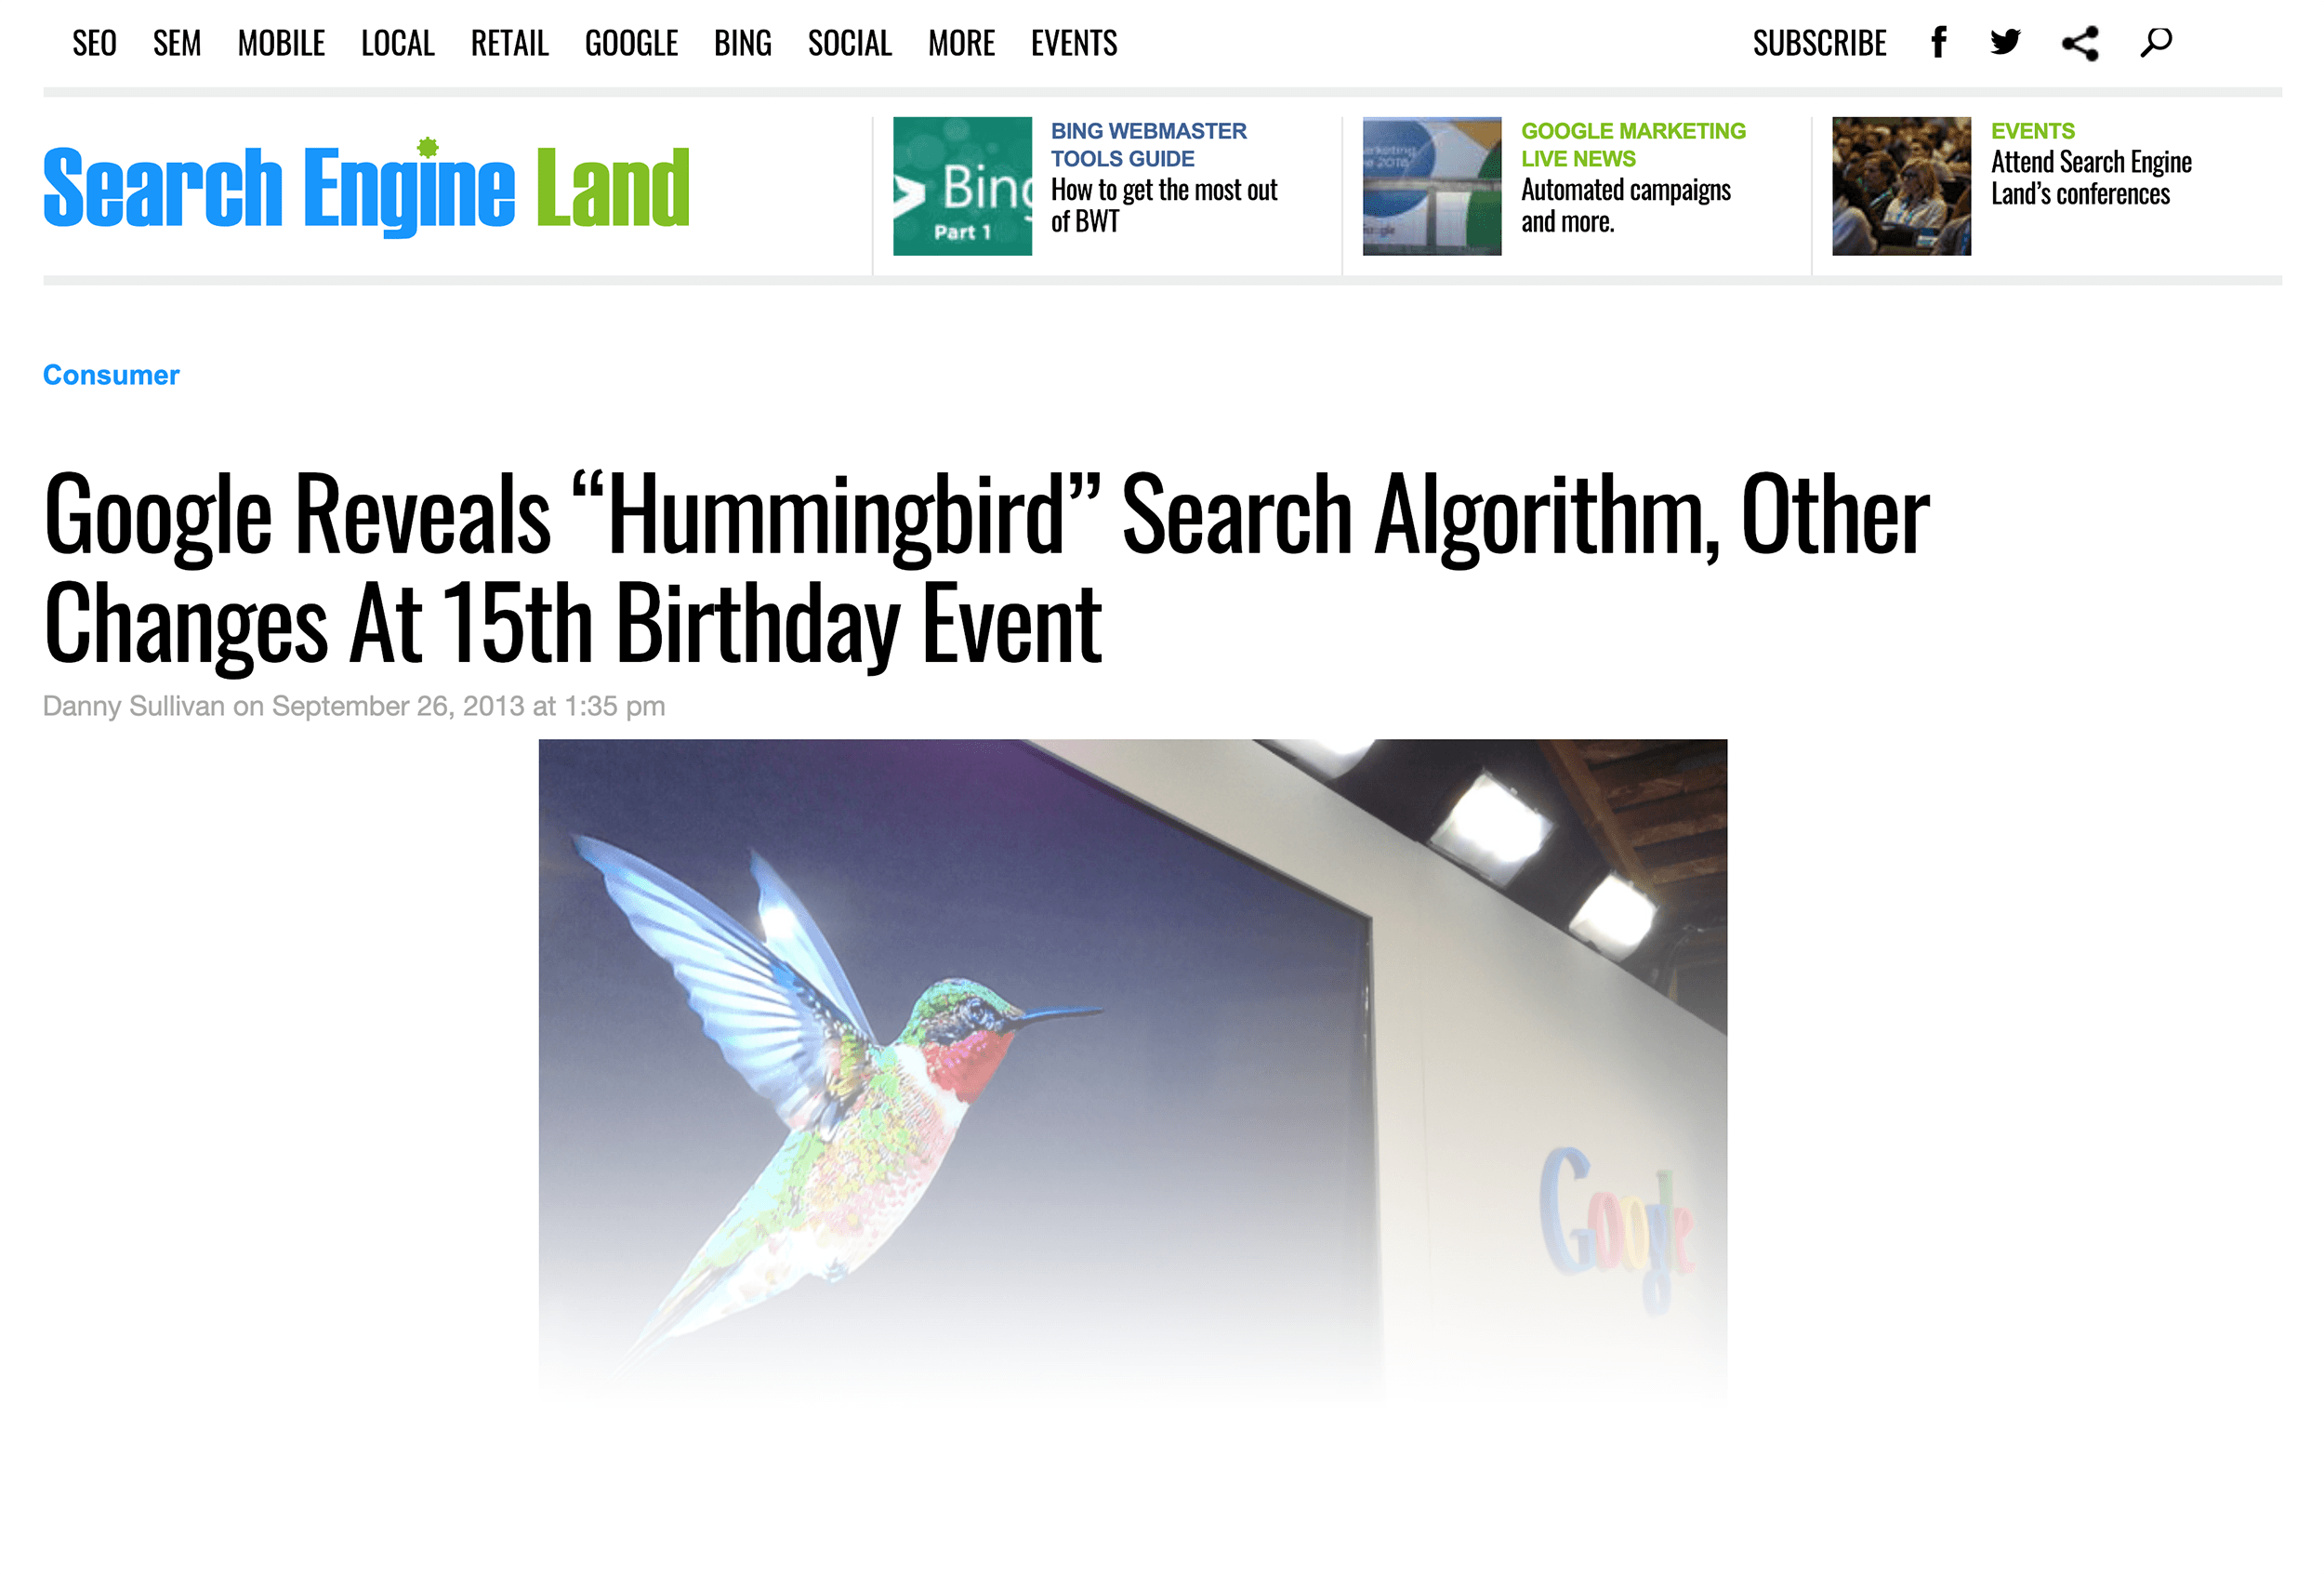 الگوریتم مرغ مگس خوار